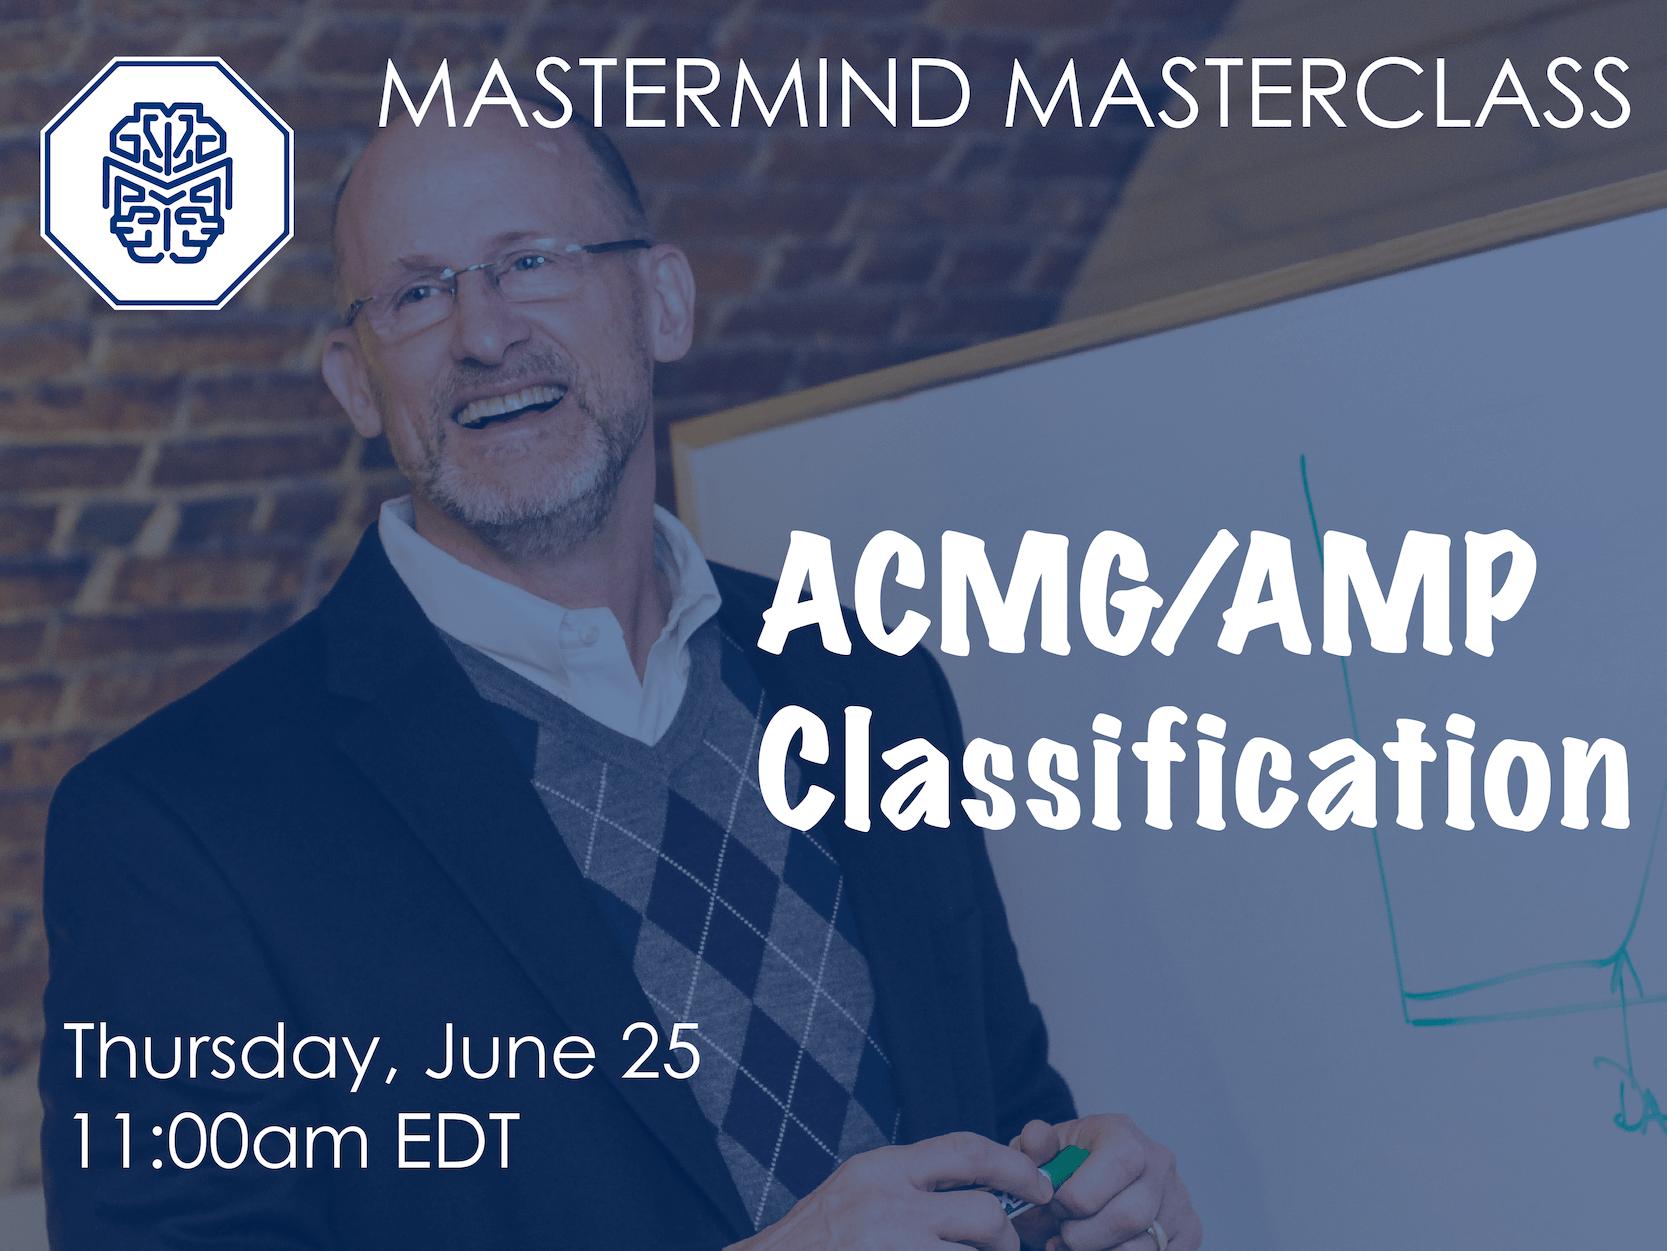 <h4>UPCOMING WEBINAR</h4> <h4><i>Mastermind Masterclass: ACMG/AMP Classification</h4></i><b>Thursday, June 25, 2020 11am EDT</b><br>